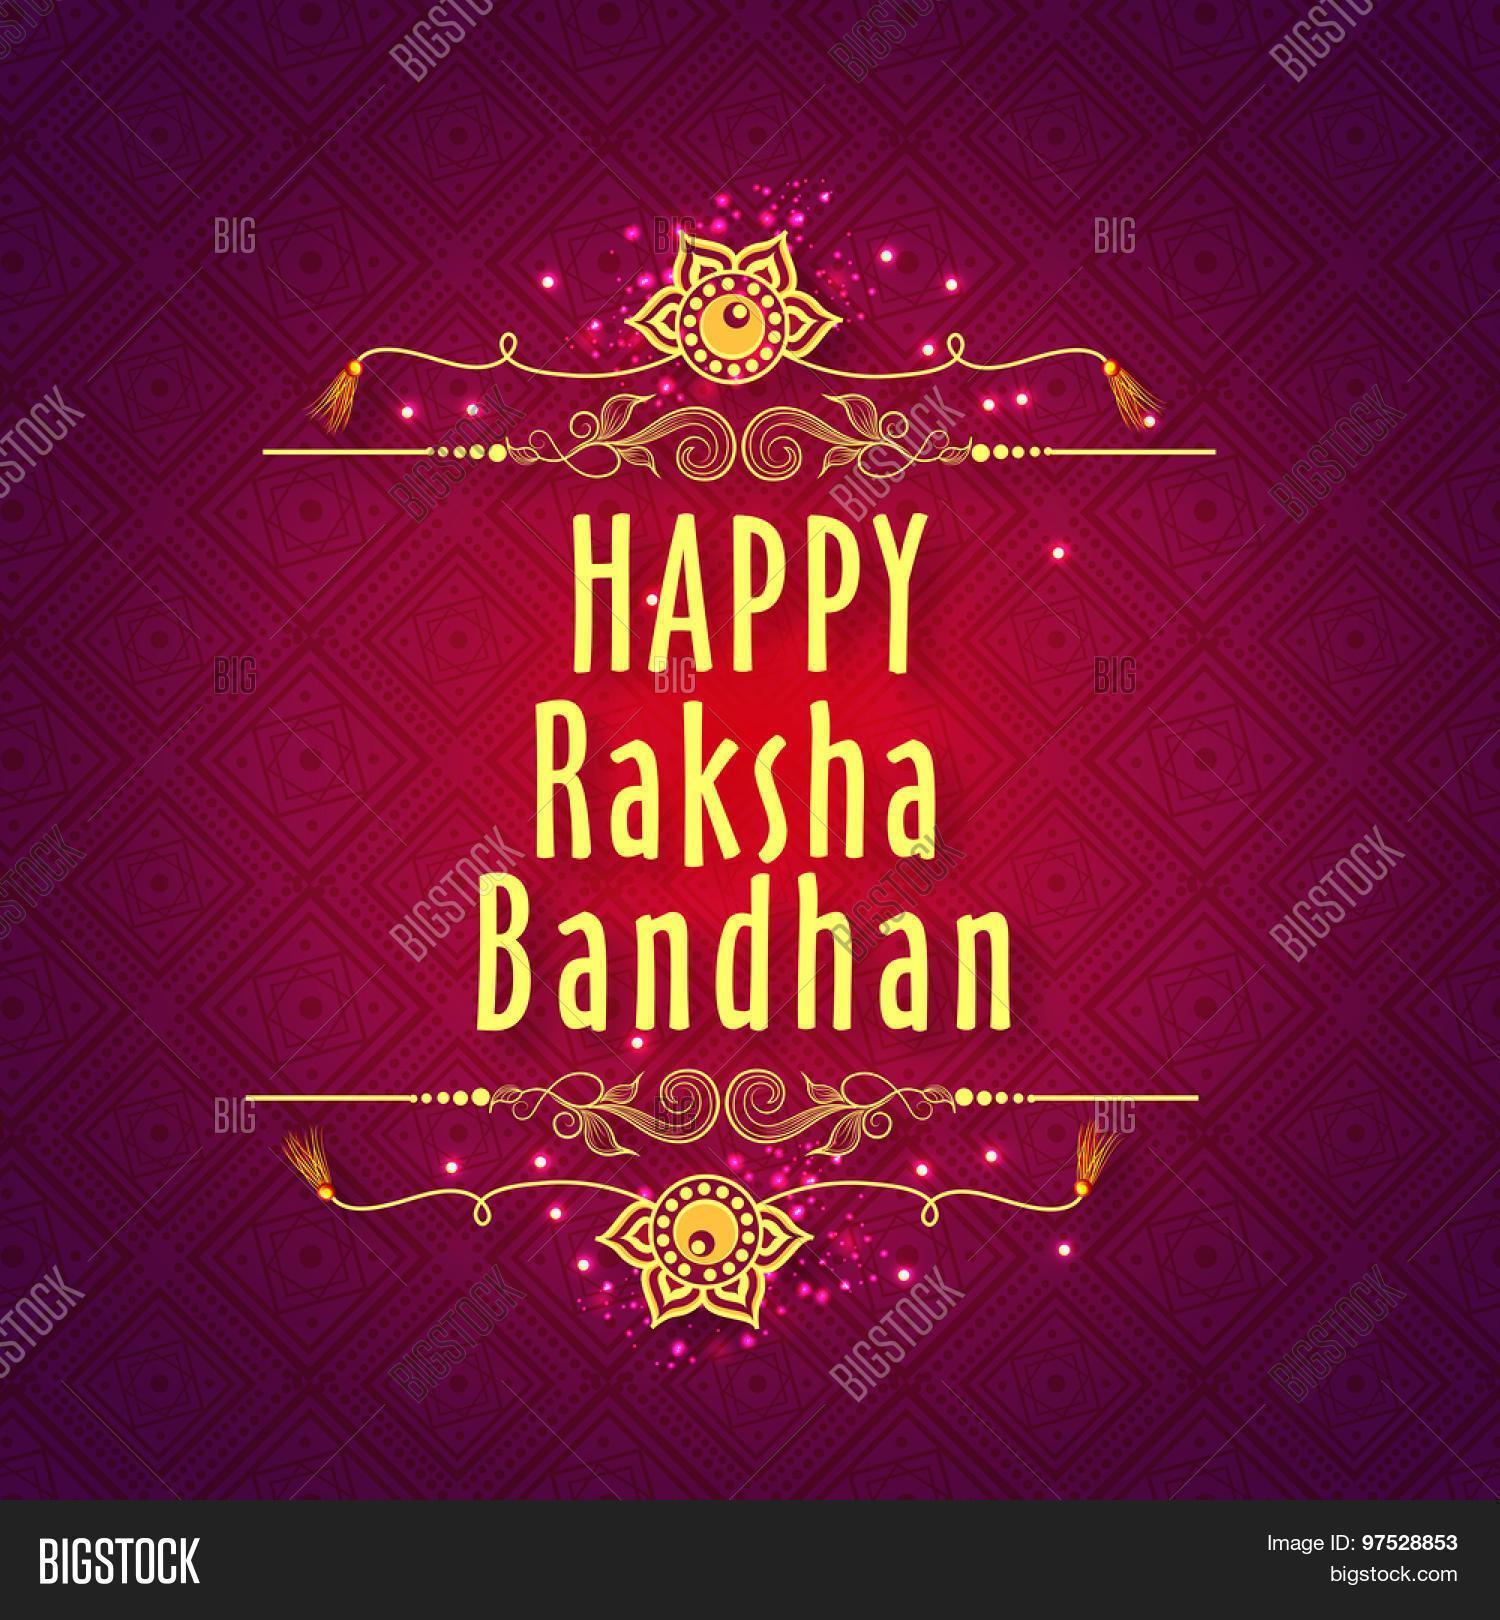 Rakhi Festival Quotes Brother: Elegant Greeting Card With Beautiful Rakhi On Floral